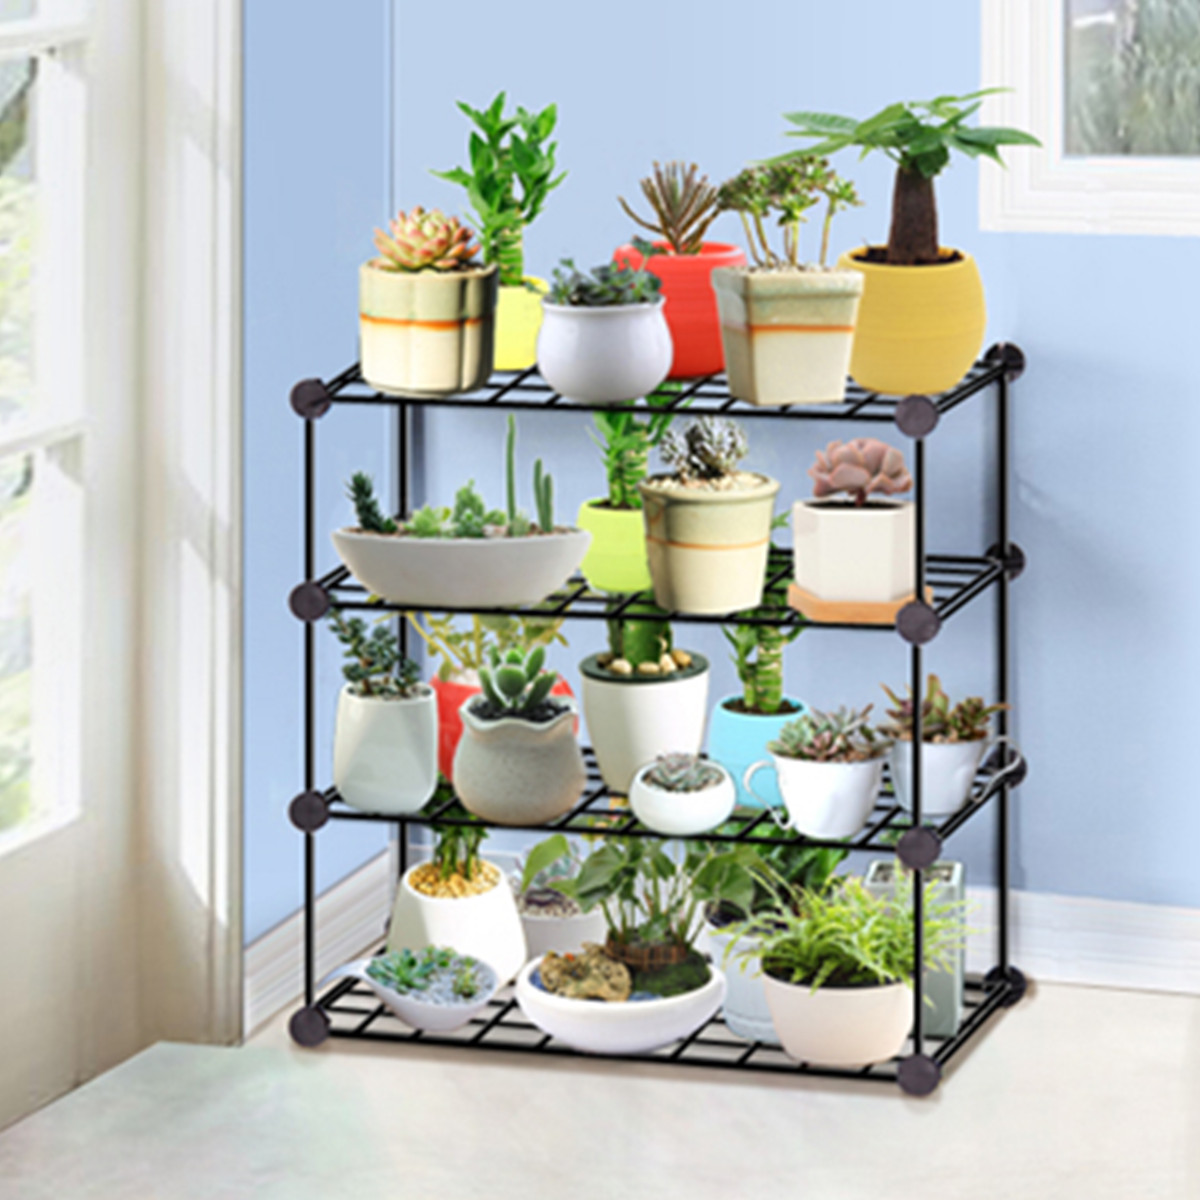 Household Wrought Iron Multi-layer Plant Stand Succulent Shelf Rack Balcony Simple Indoor Coffee Bar Garden Flower Pot Shelf